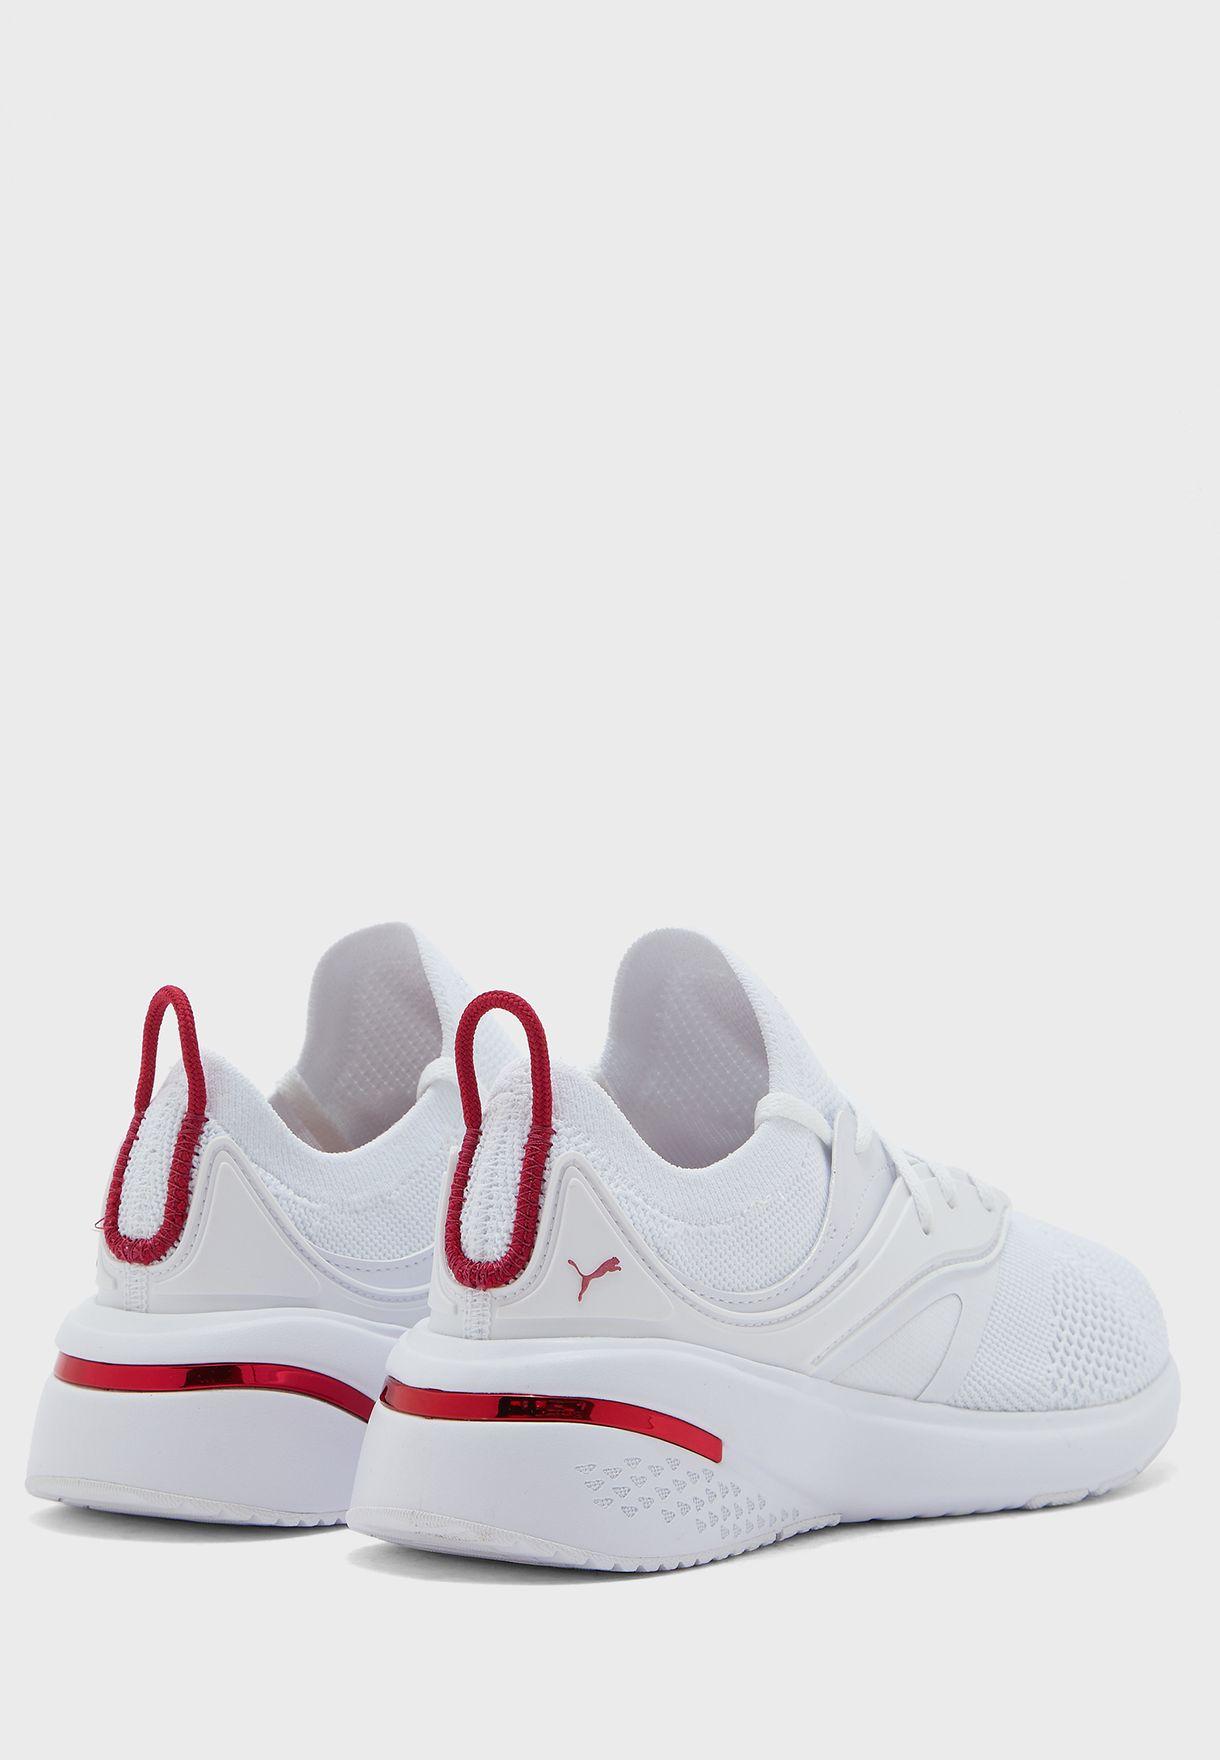 حذاء فوريفر اكس تي